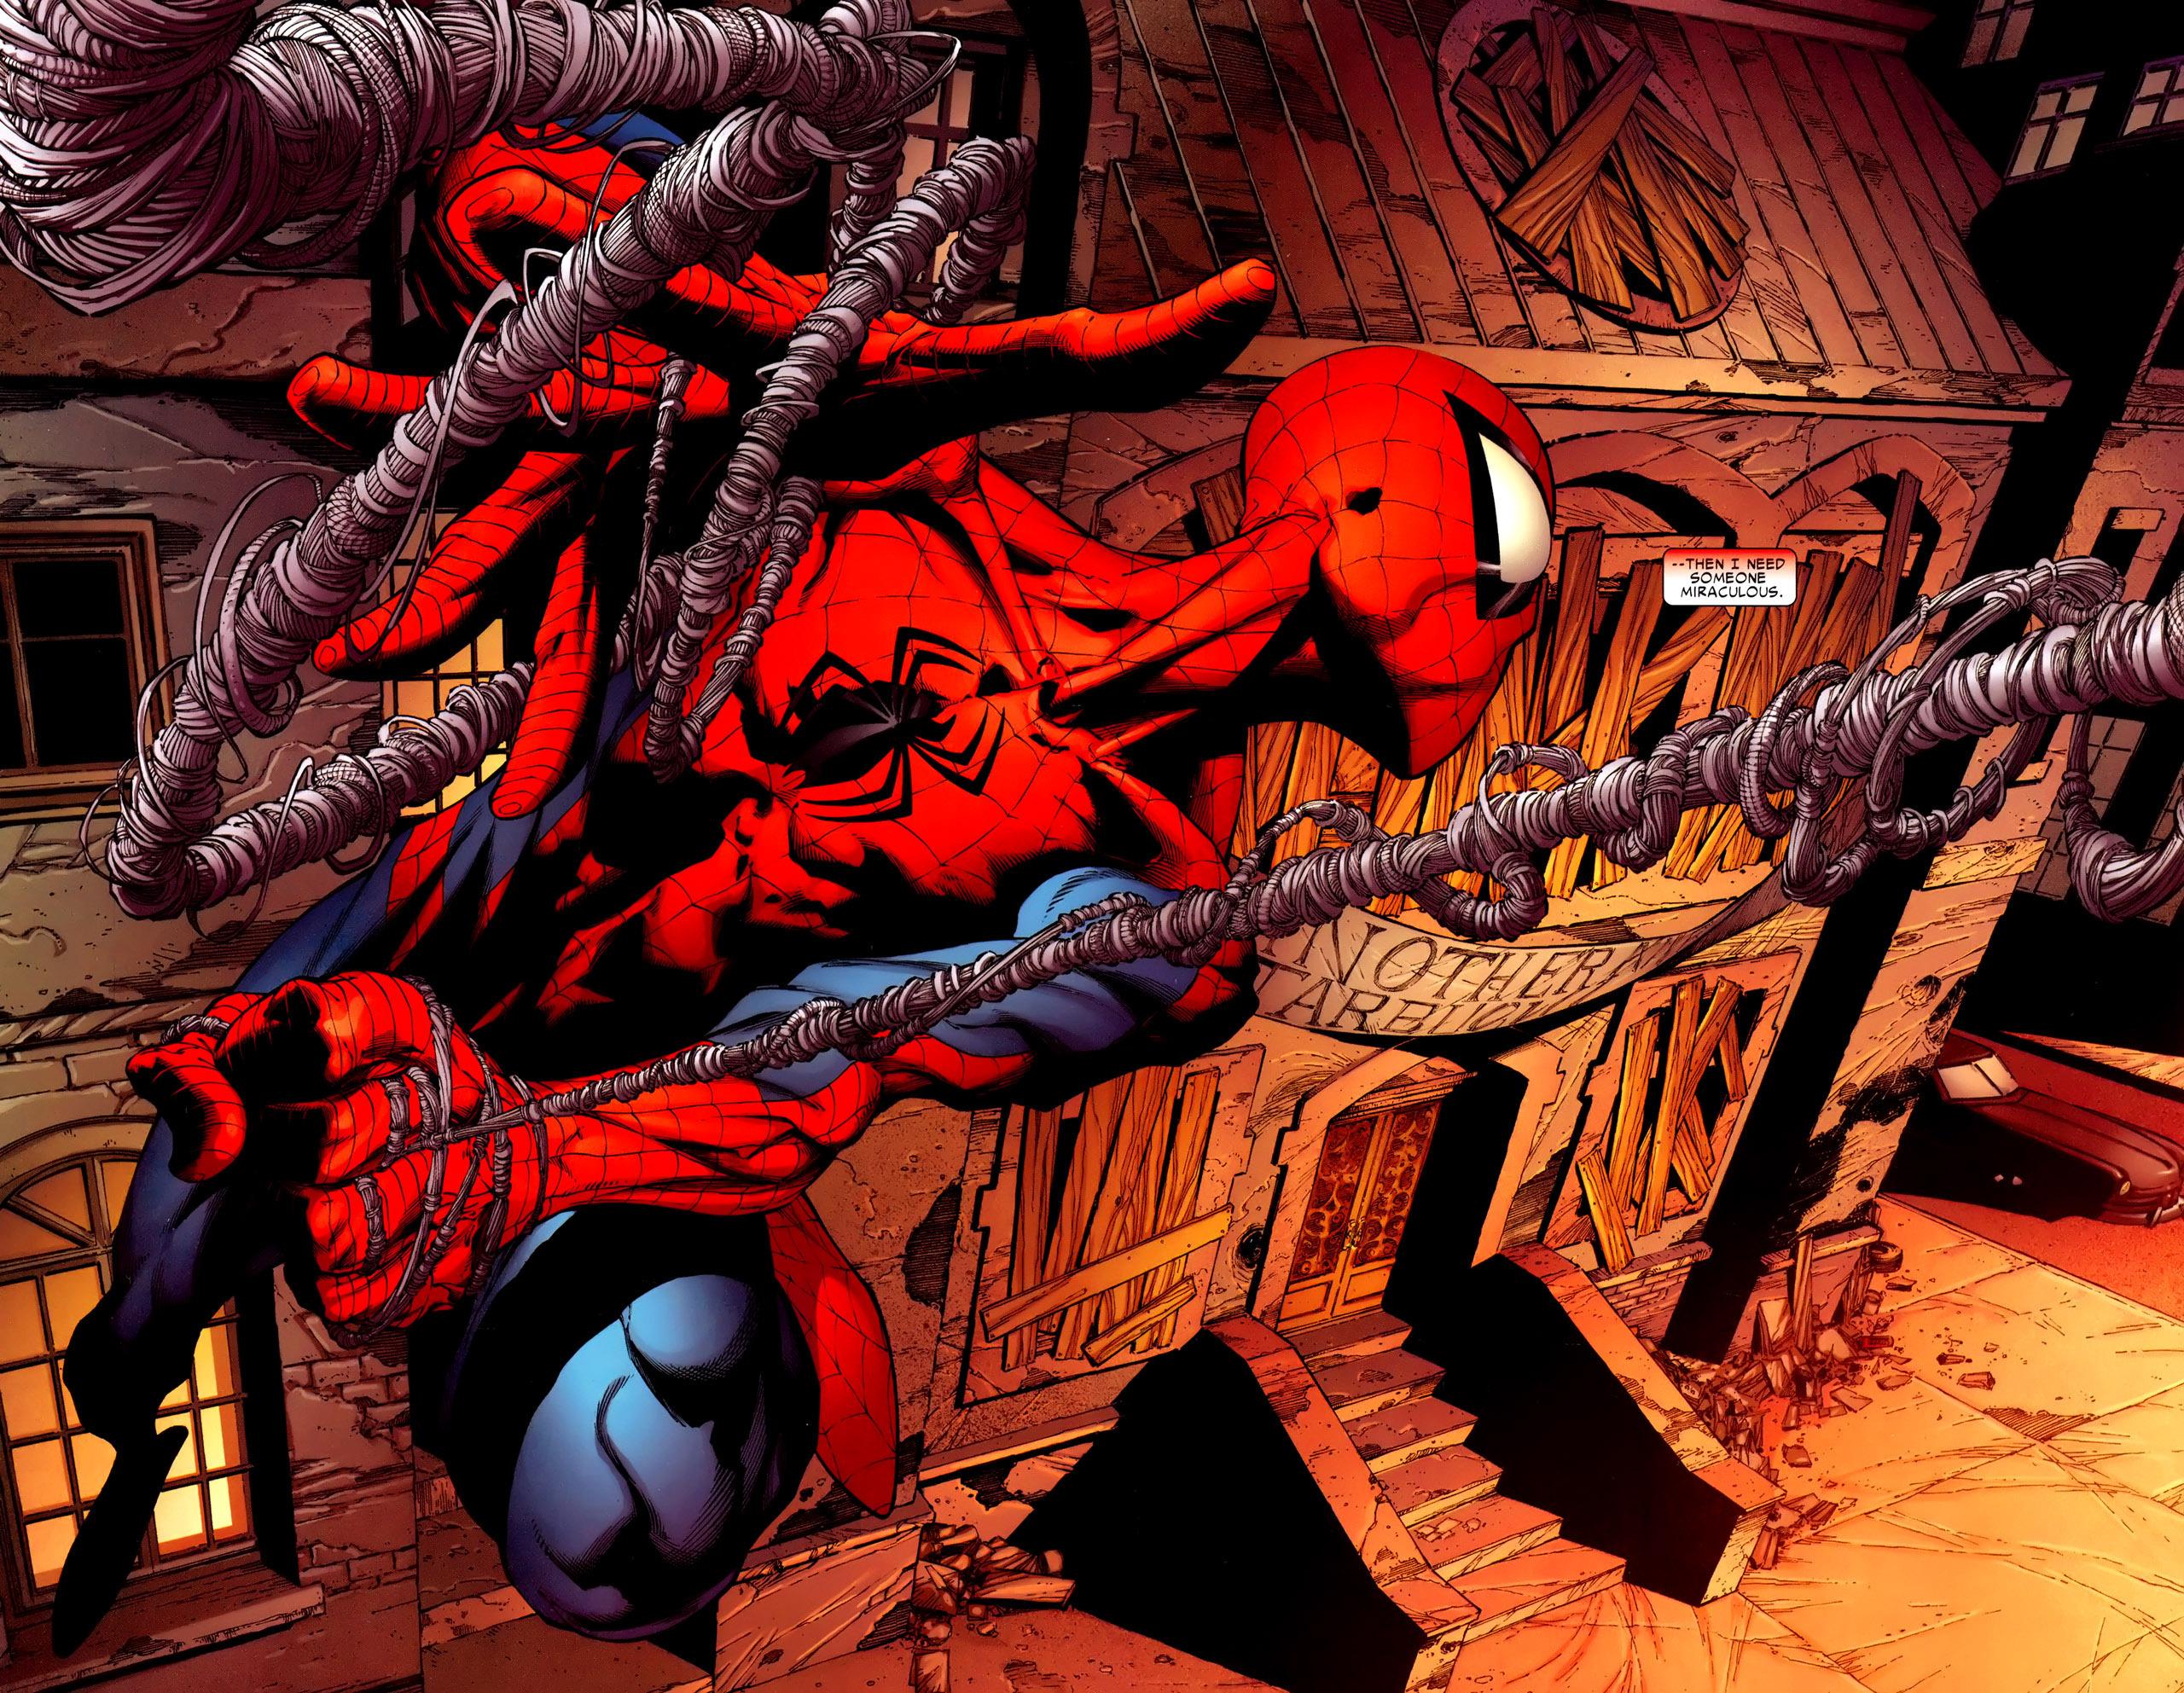 Most Inspiring Wallpaper Marvel Iphone 5 - Spider-man-comic-spiderman-super-hero-wallpapers-fantasy-download(1)  Pic_611537.jpg